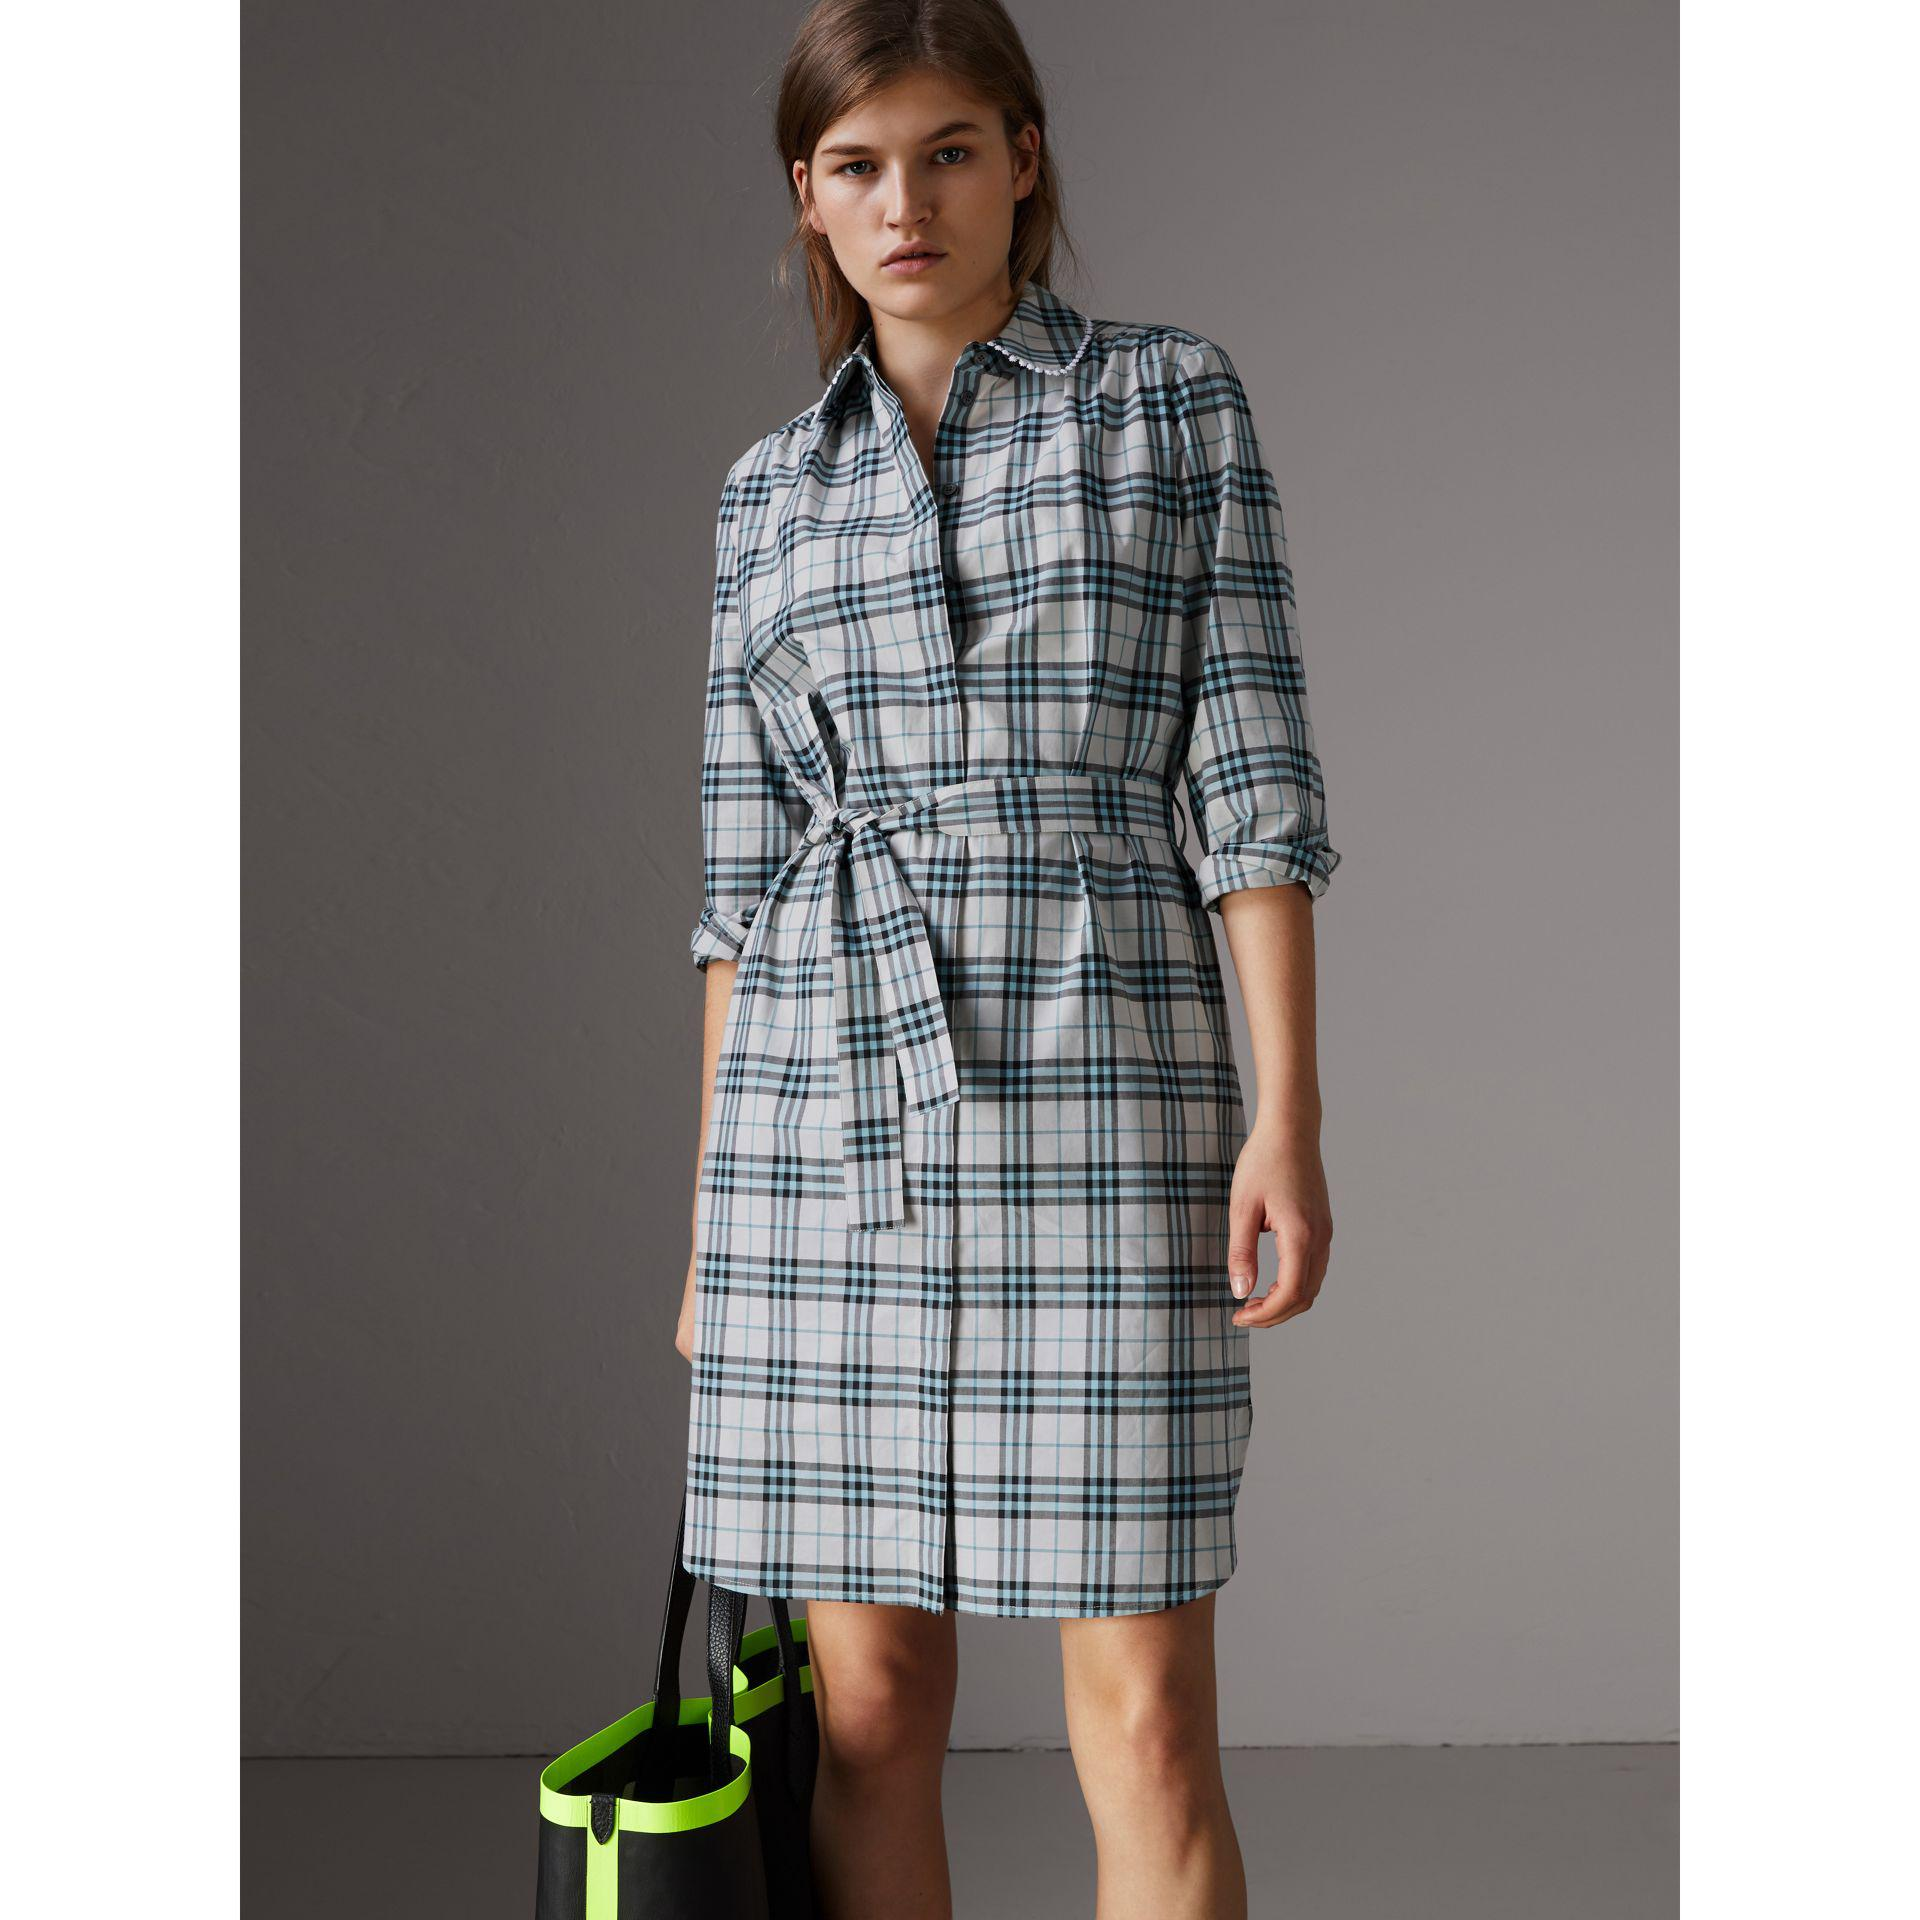 Lyst Burberry Lace Trim Collar Check Cotton Shirt Dress